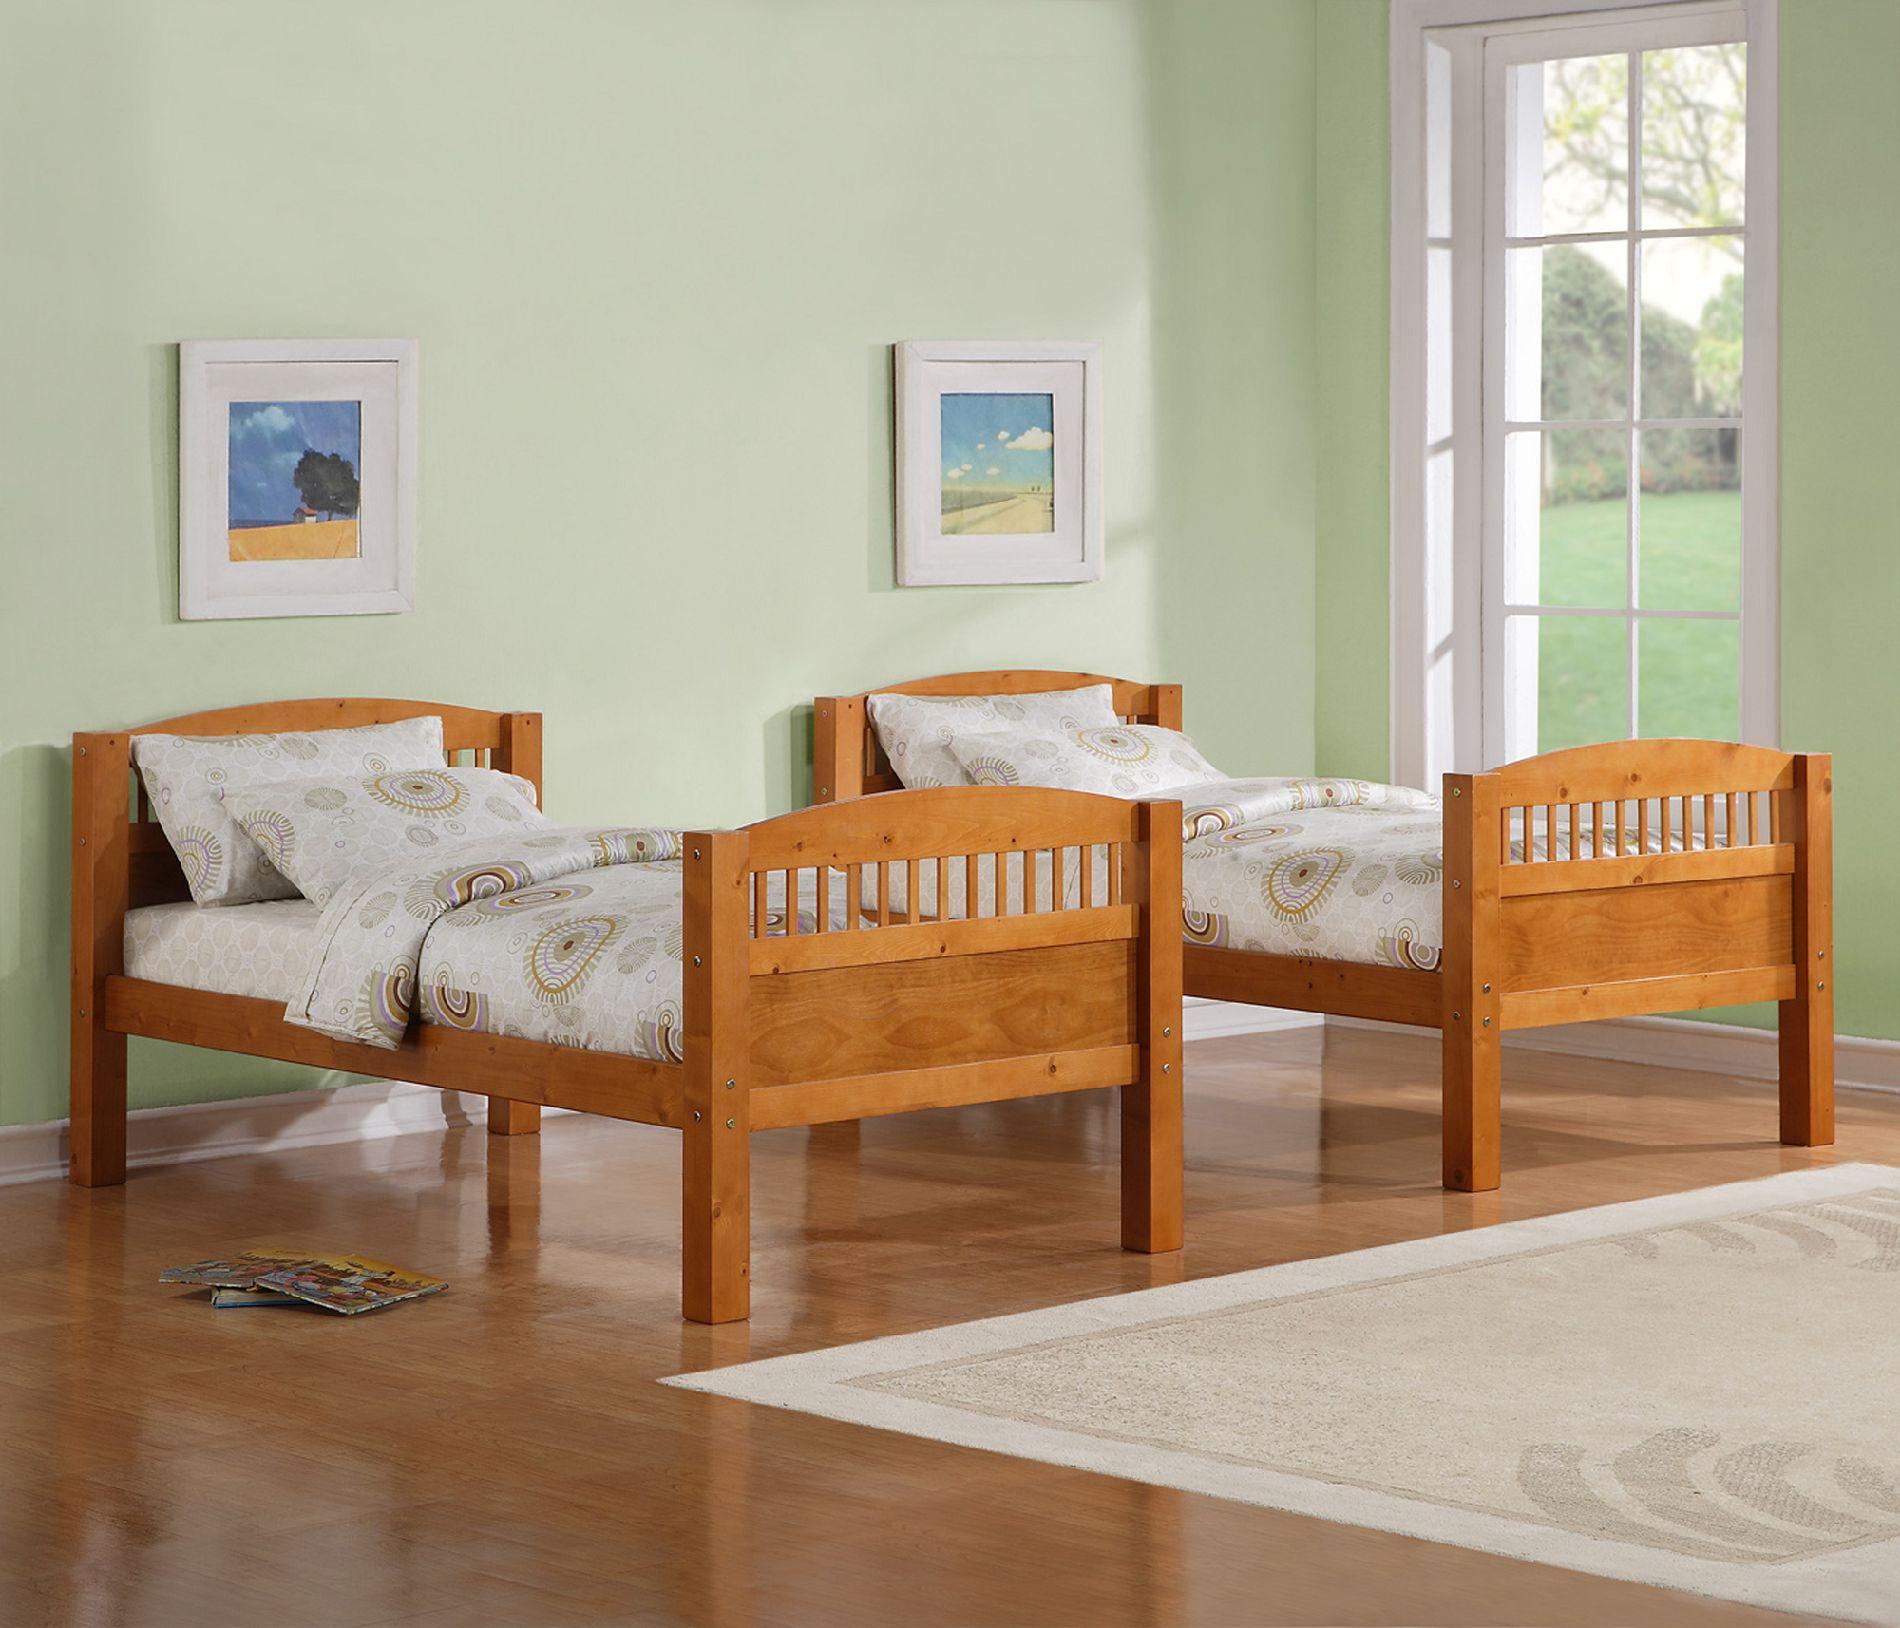 Dorel Home Furnishings Bunk Bed Pine